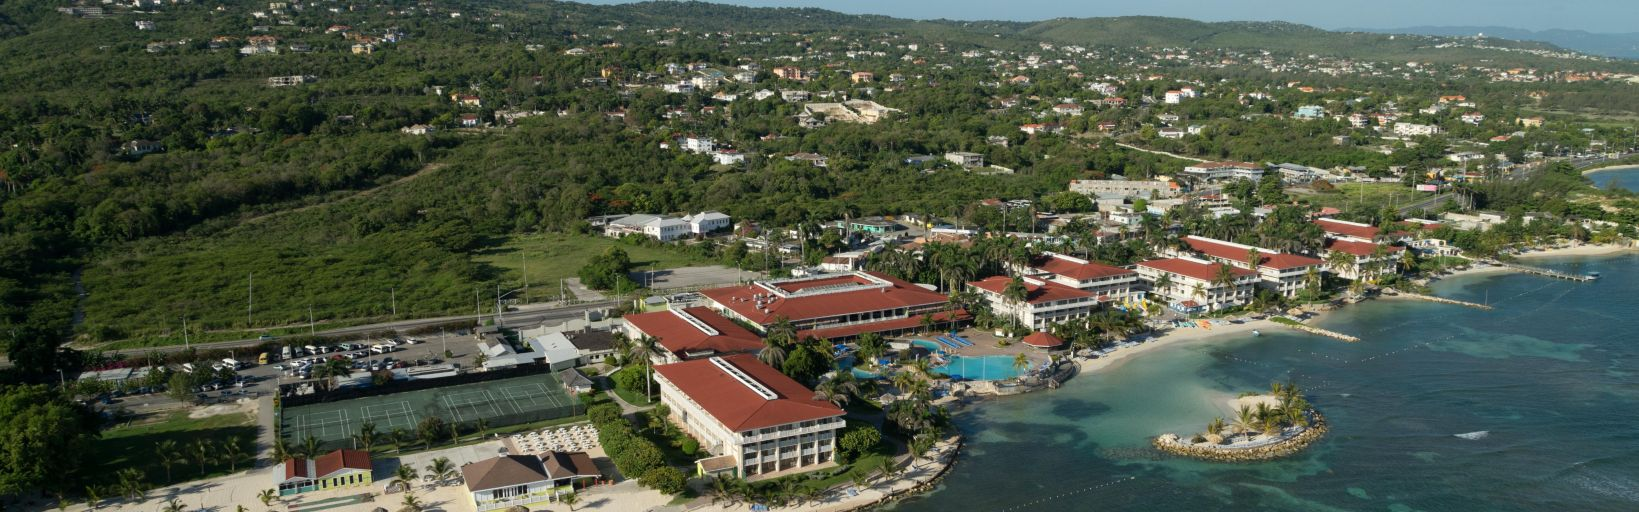 Montego Bay Hotel And Resort Holiday Inn AllInclusive Resort - All inclusive resorts montego bay